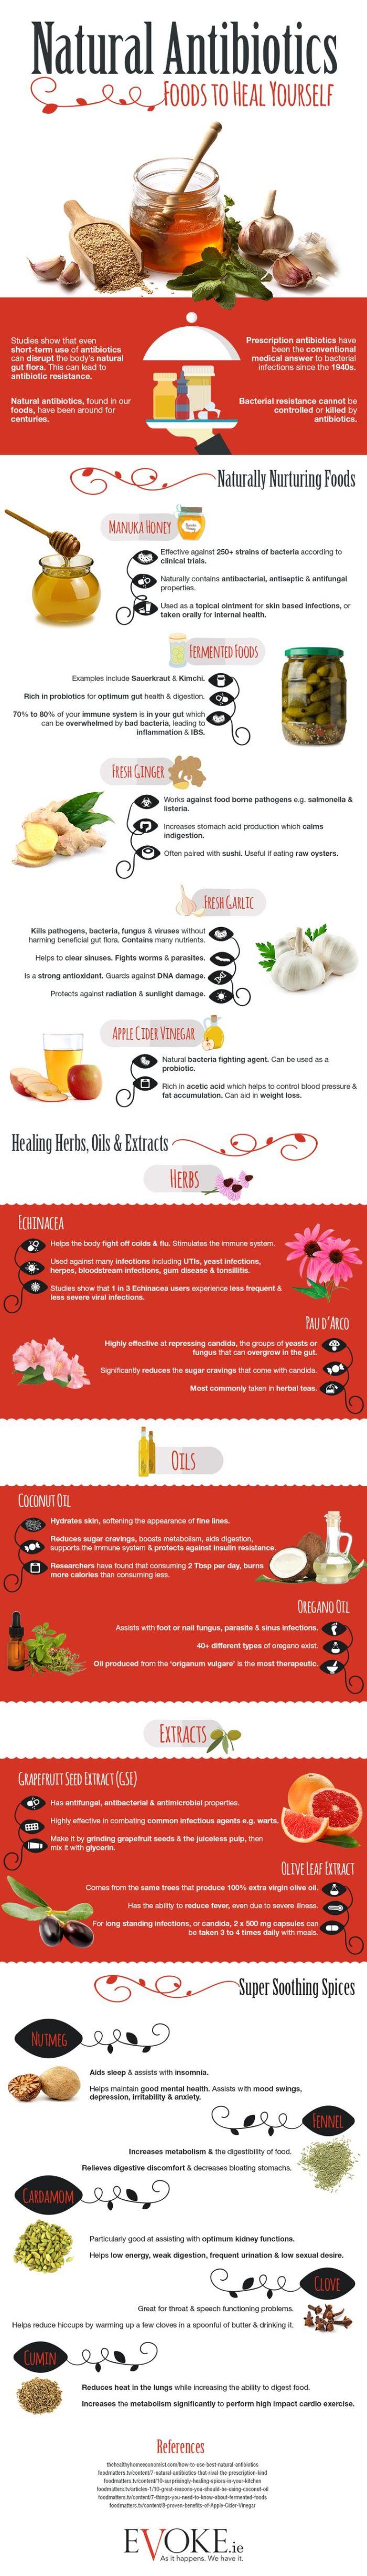 Natural Antibiotics, Foods to Heal Yourself